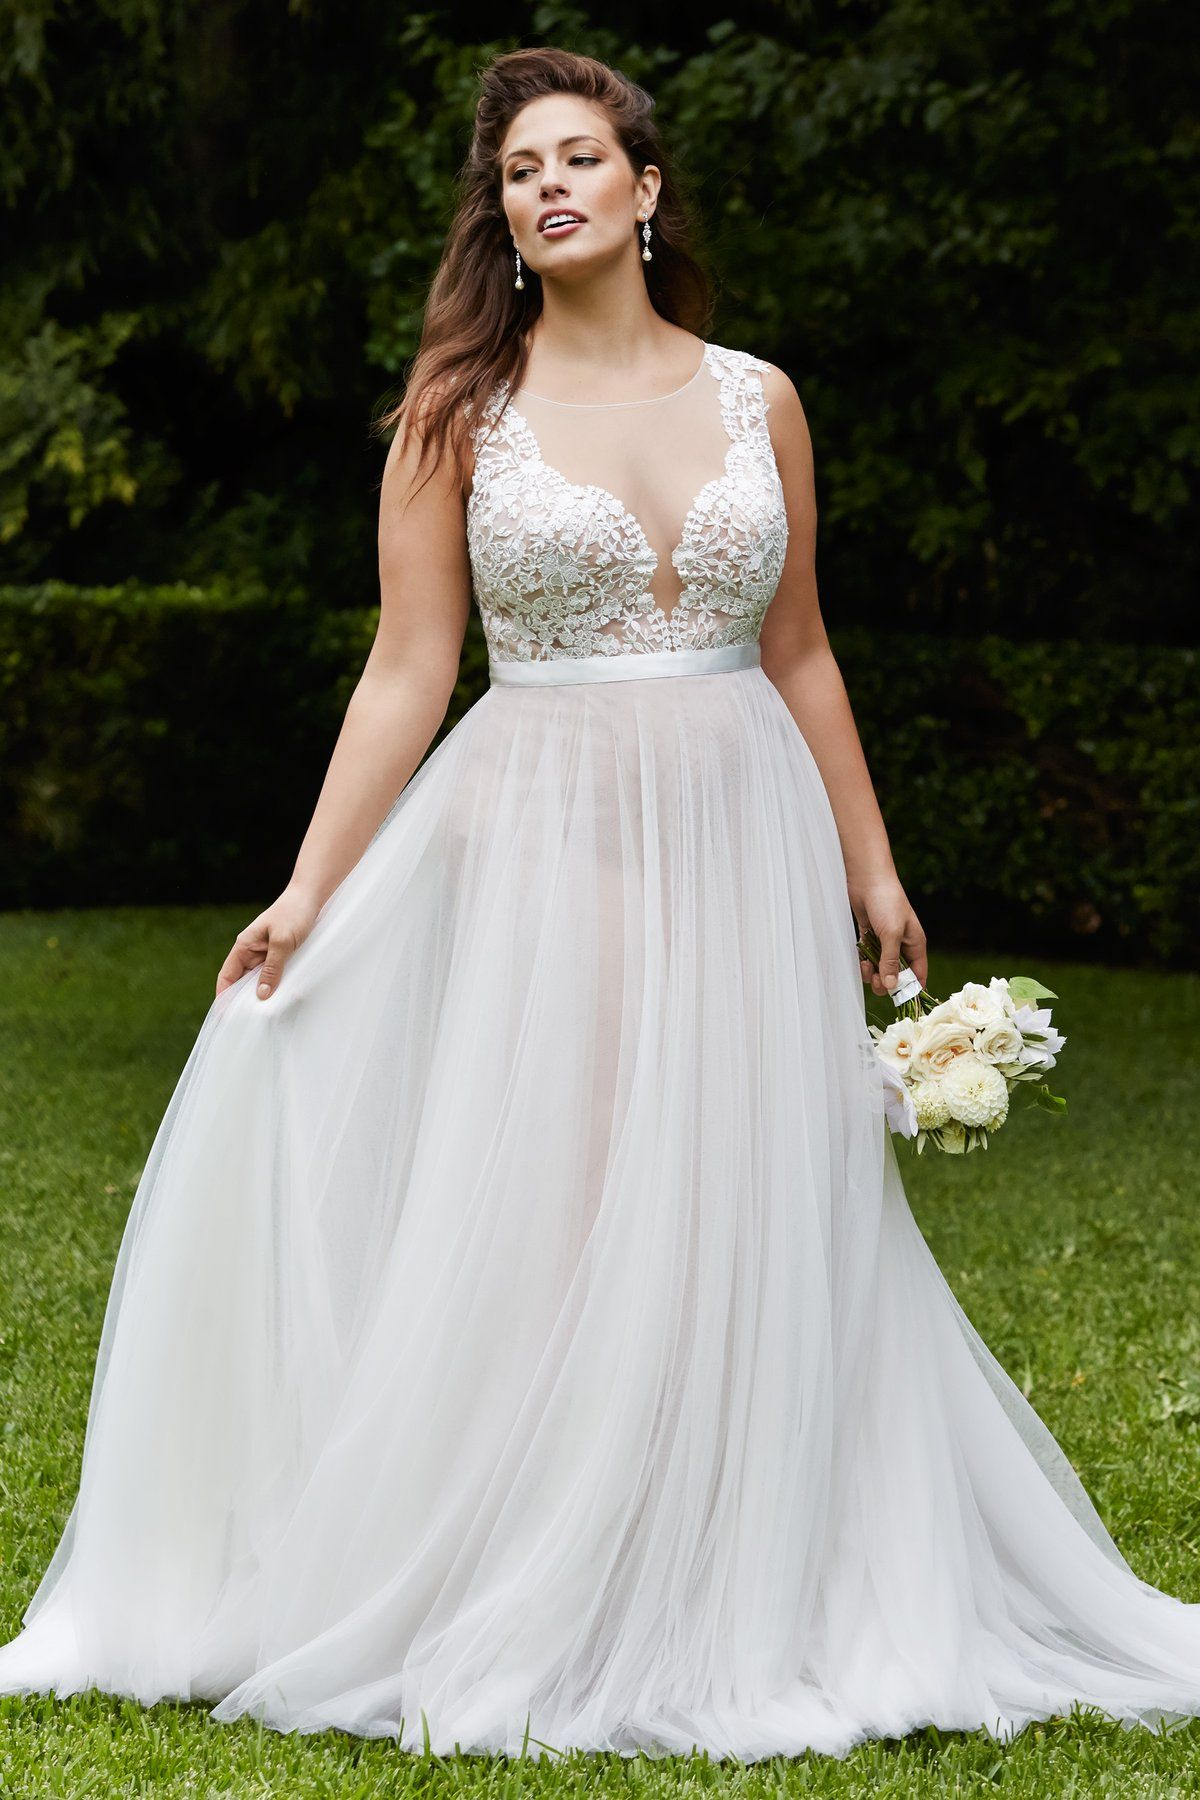 Wedding dresses for curvy brides  Wtoo Brides Marnie Gown  My Wedding  Dresses  Pinterest